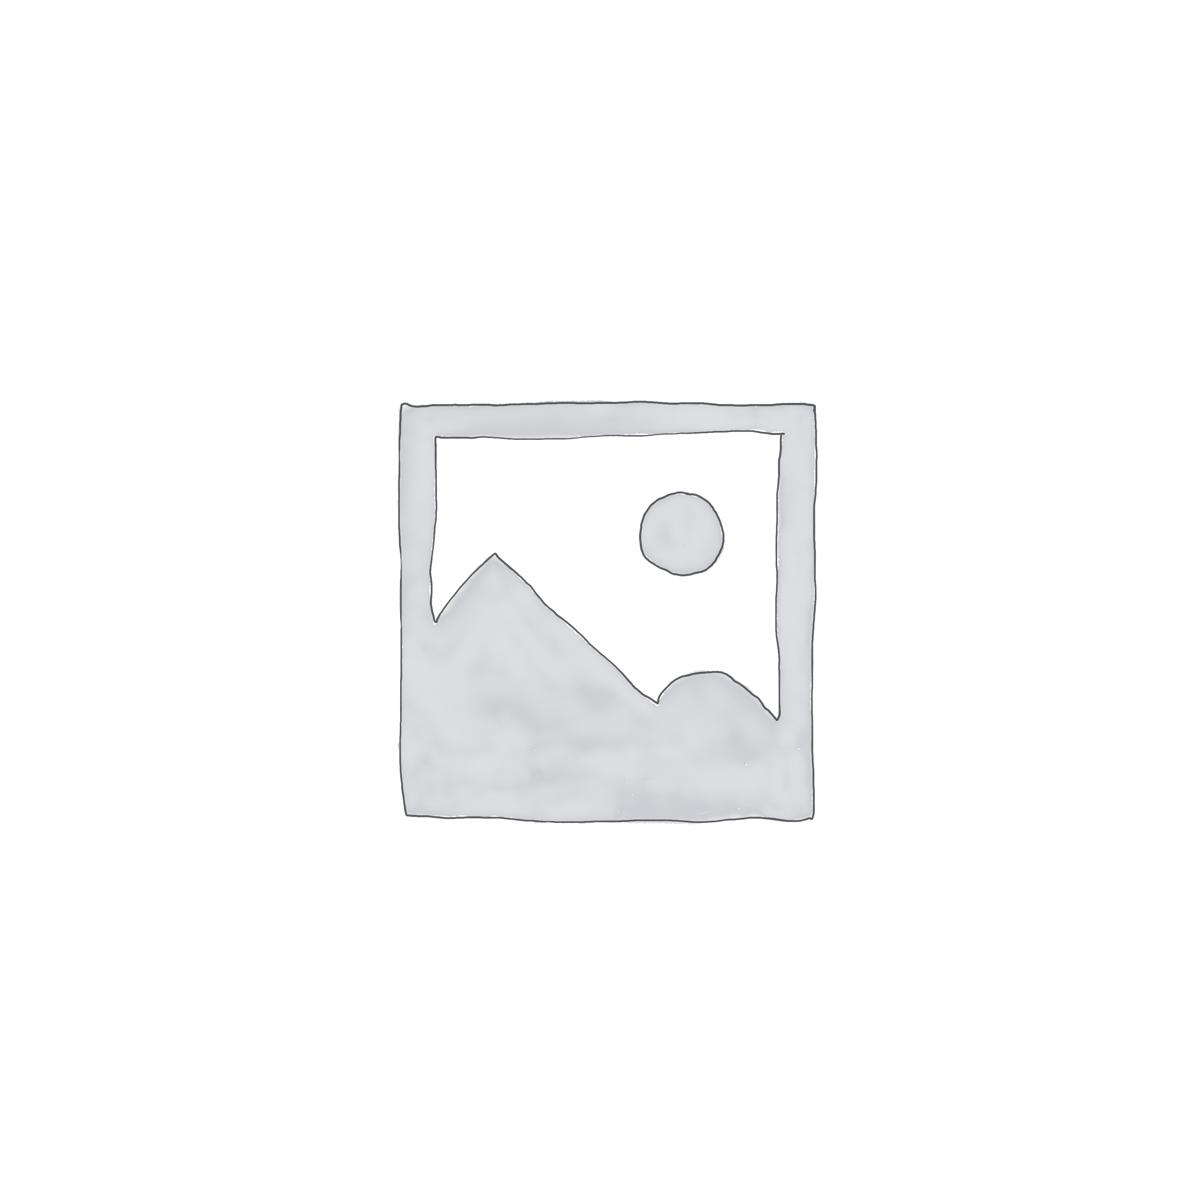 — Konica bizhub C454/C554